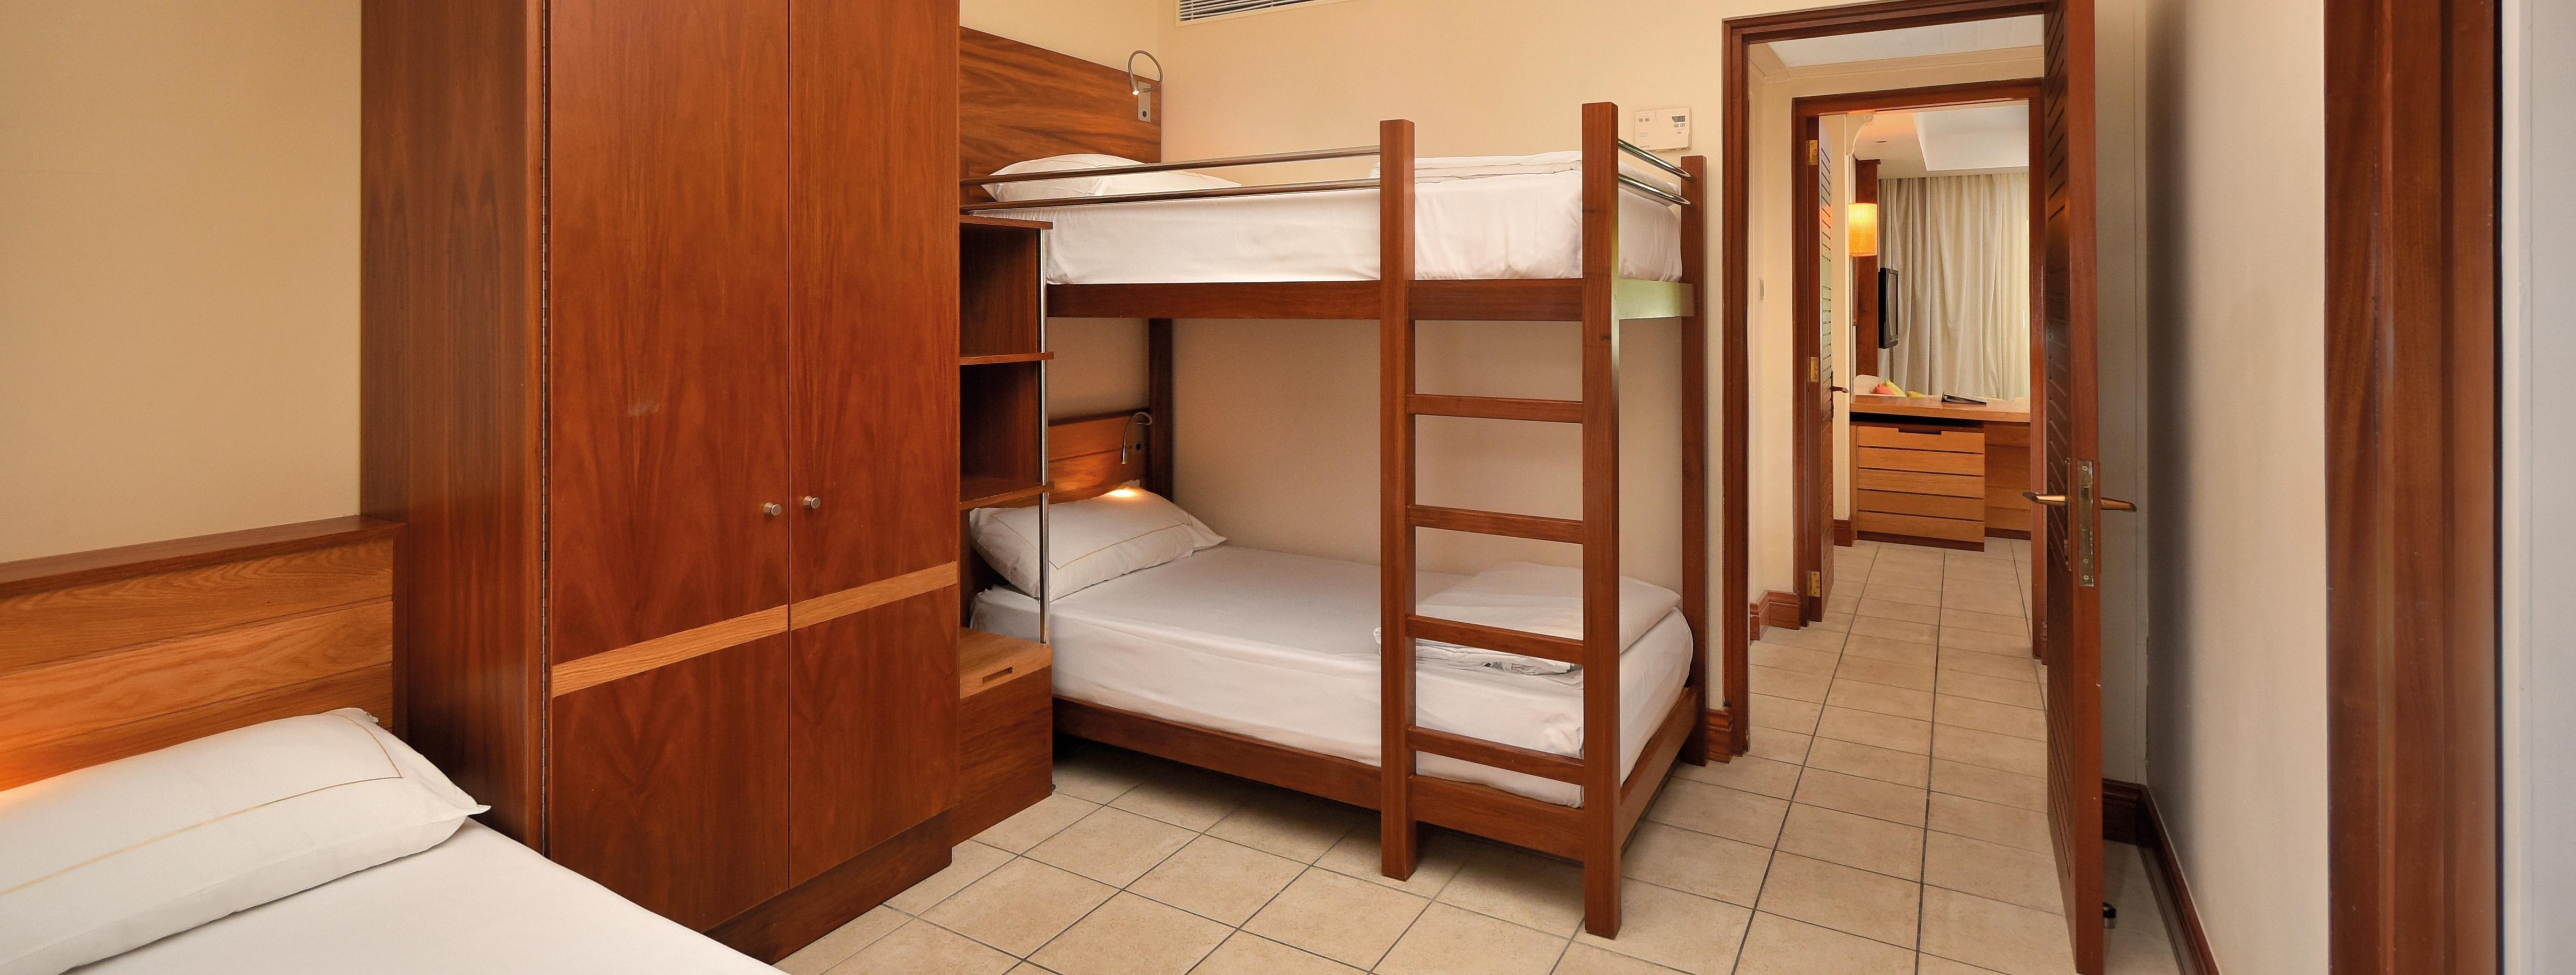 shandrani-mauritius-bunk-bedroom